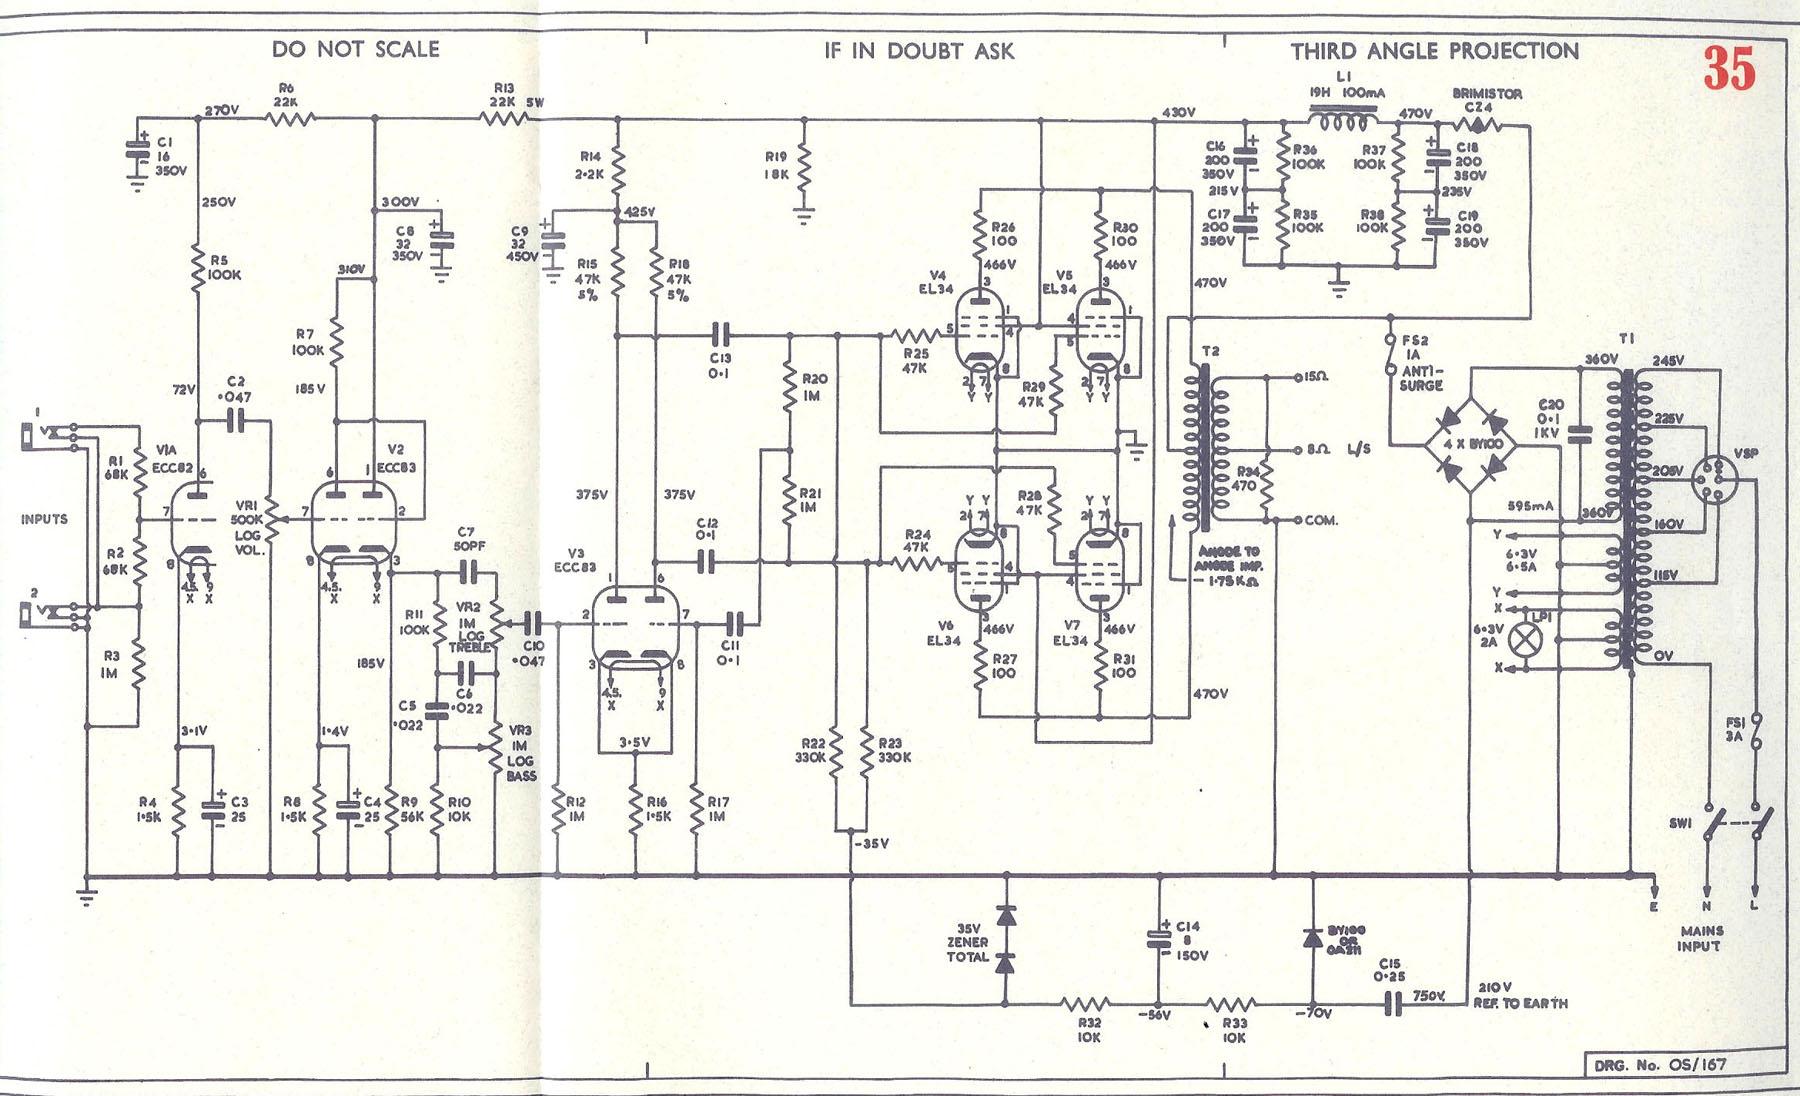 vox v100 amplifier